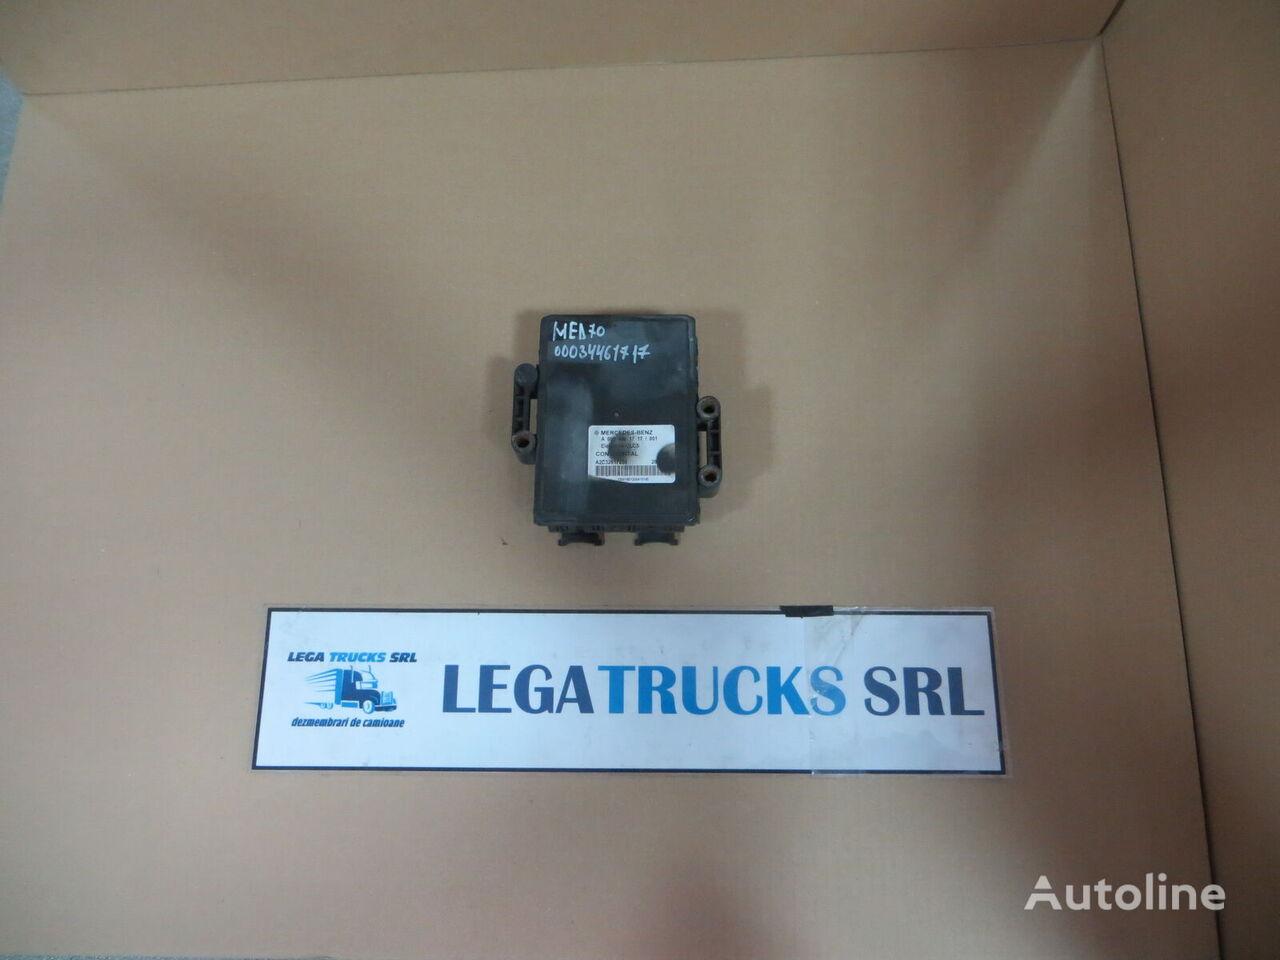 MERCEDES-BENZ unidad de control para MERCEDES-BENZ Actros MP4 tractora